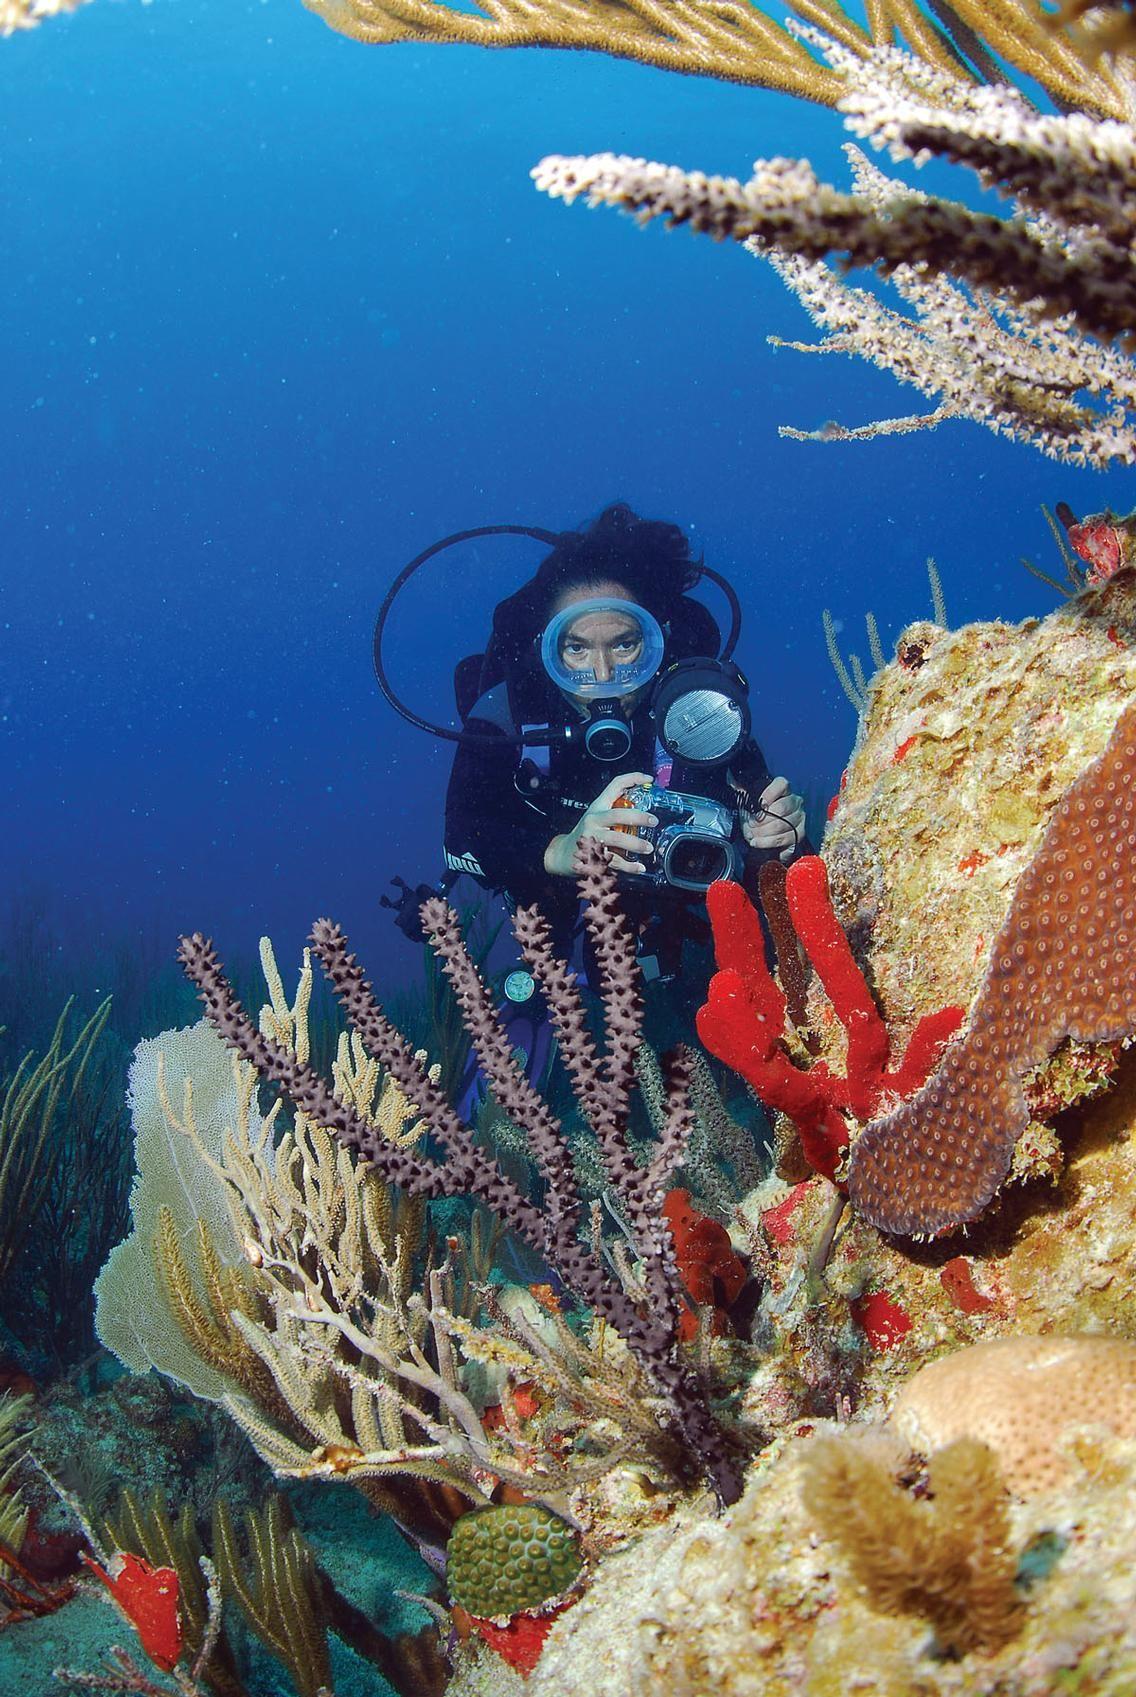 Scuba Diving In The British Virgin Islands